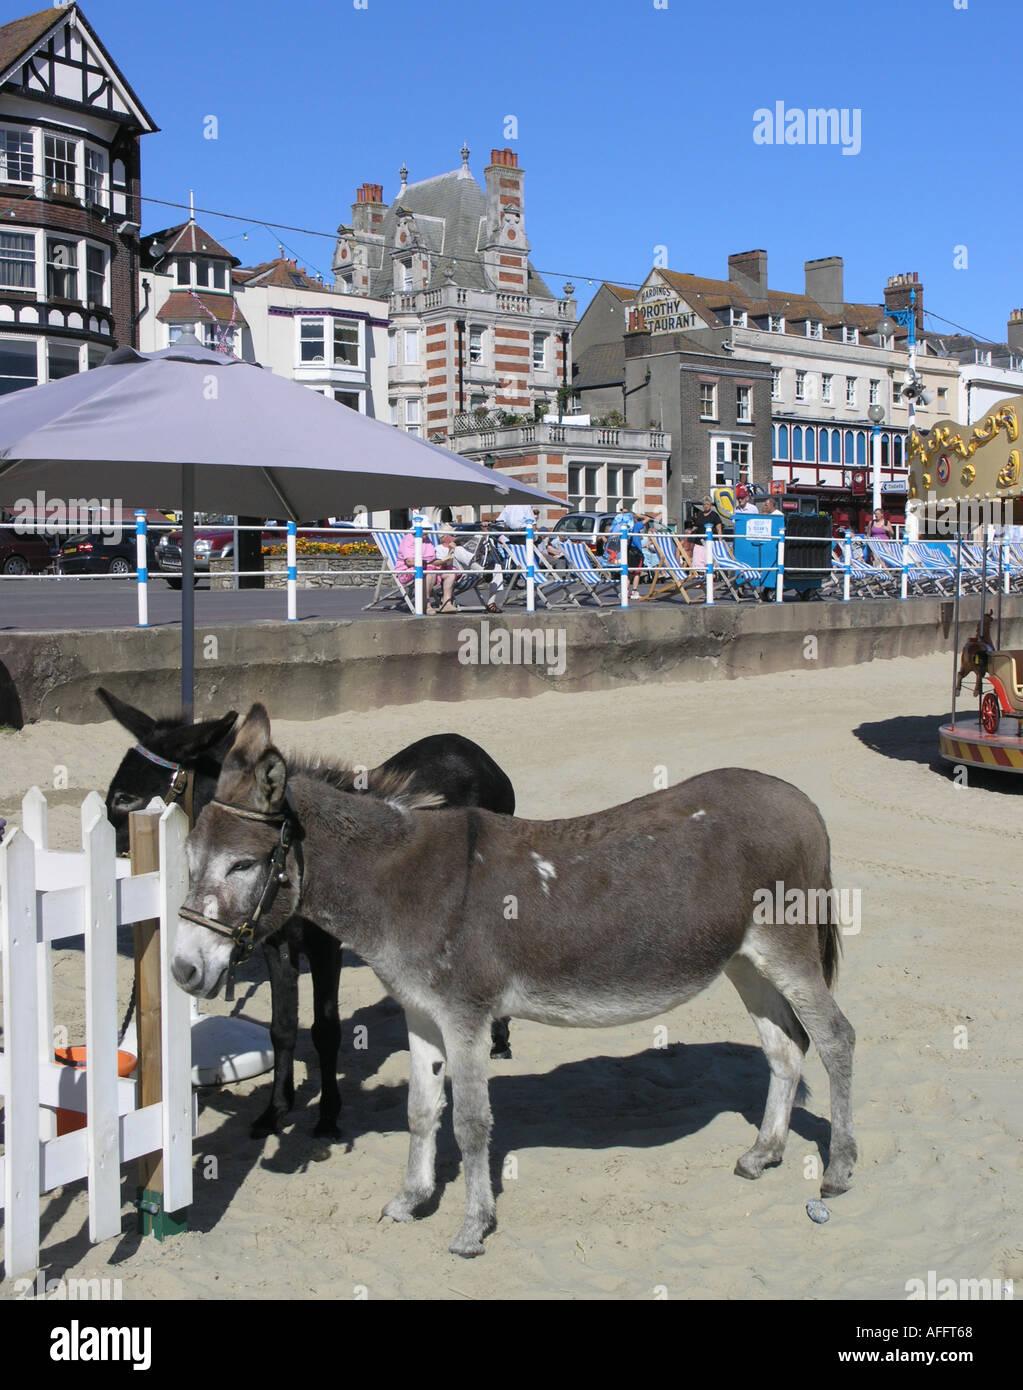 Donkeys on the beach at Weymouth Dorset Stock Photo